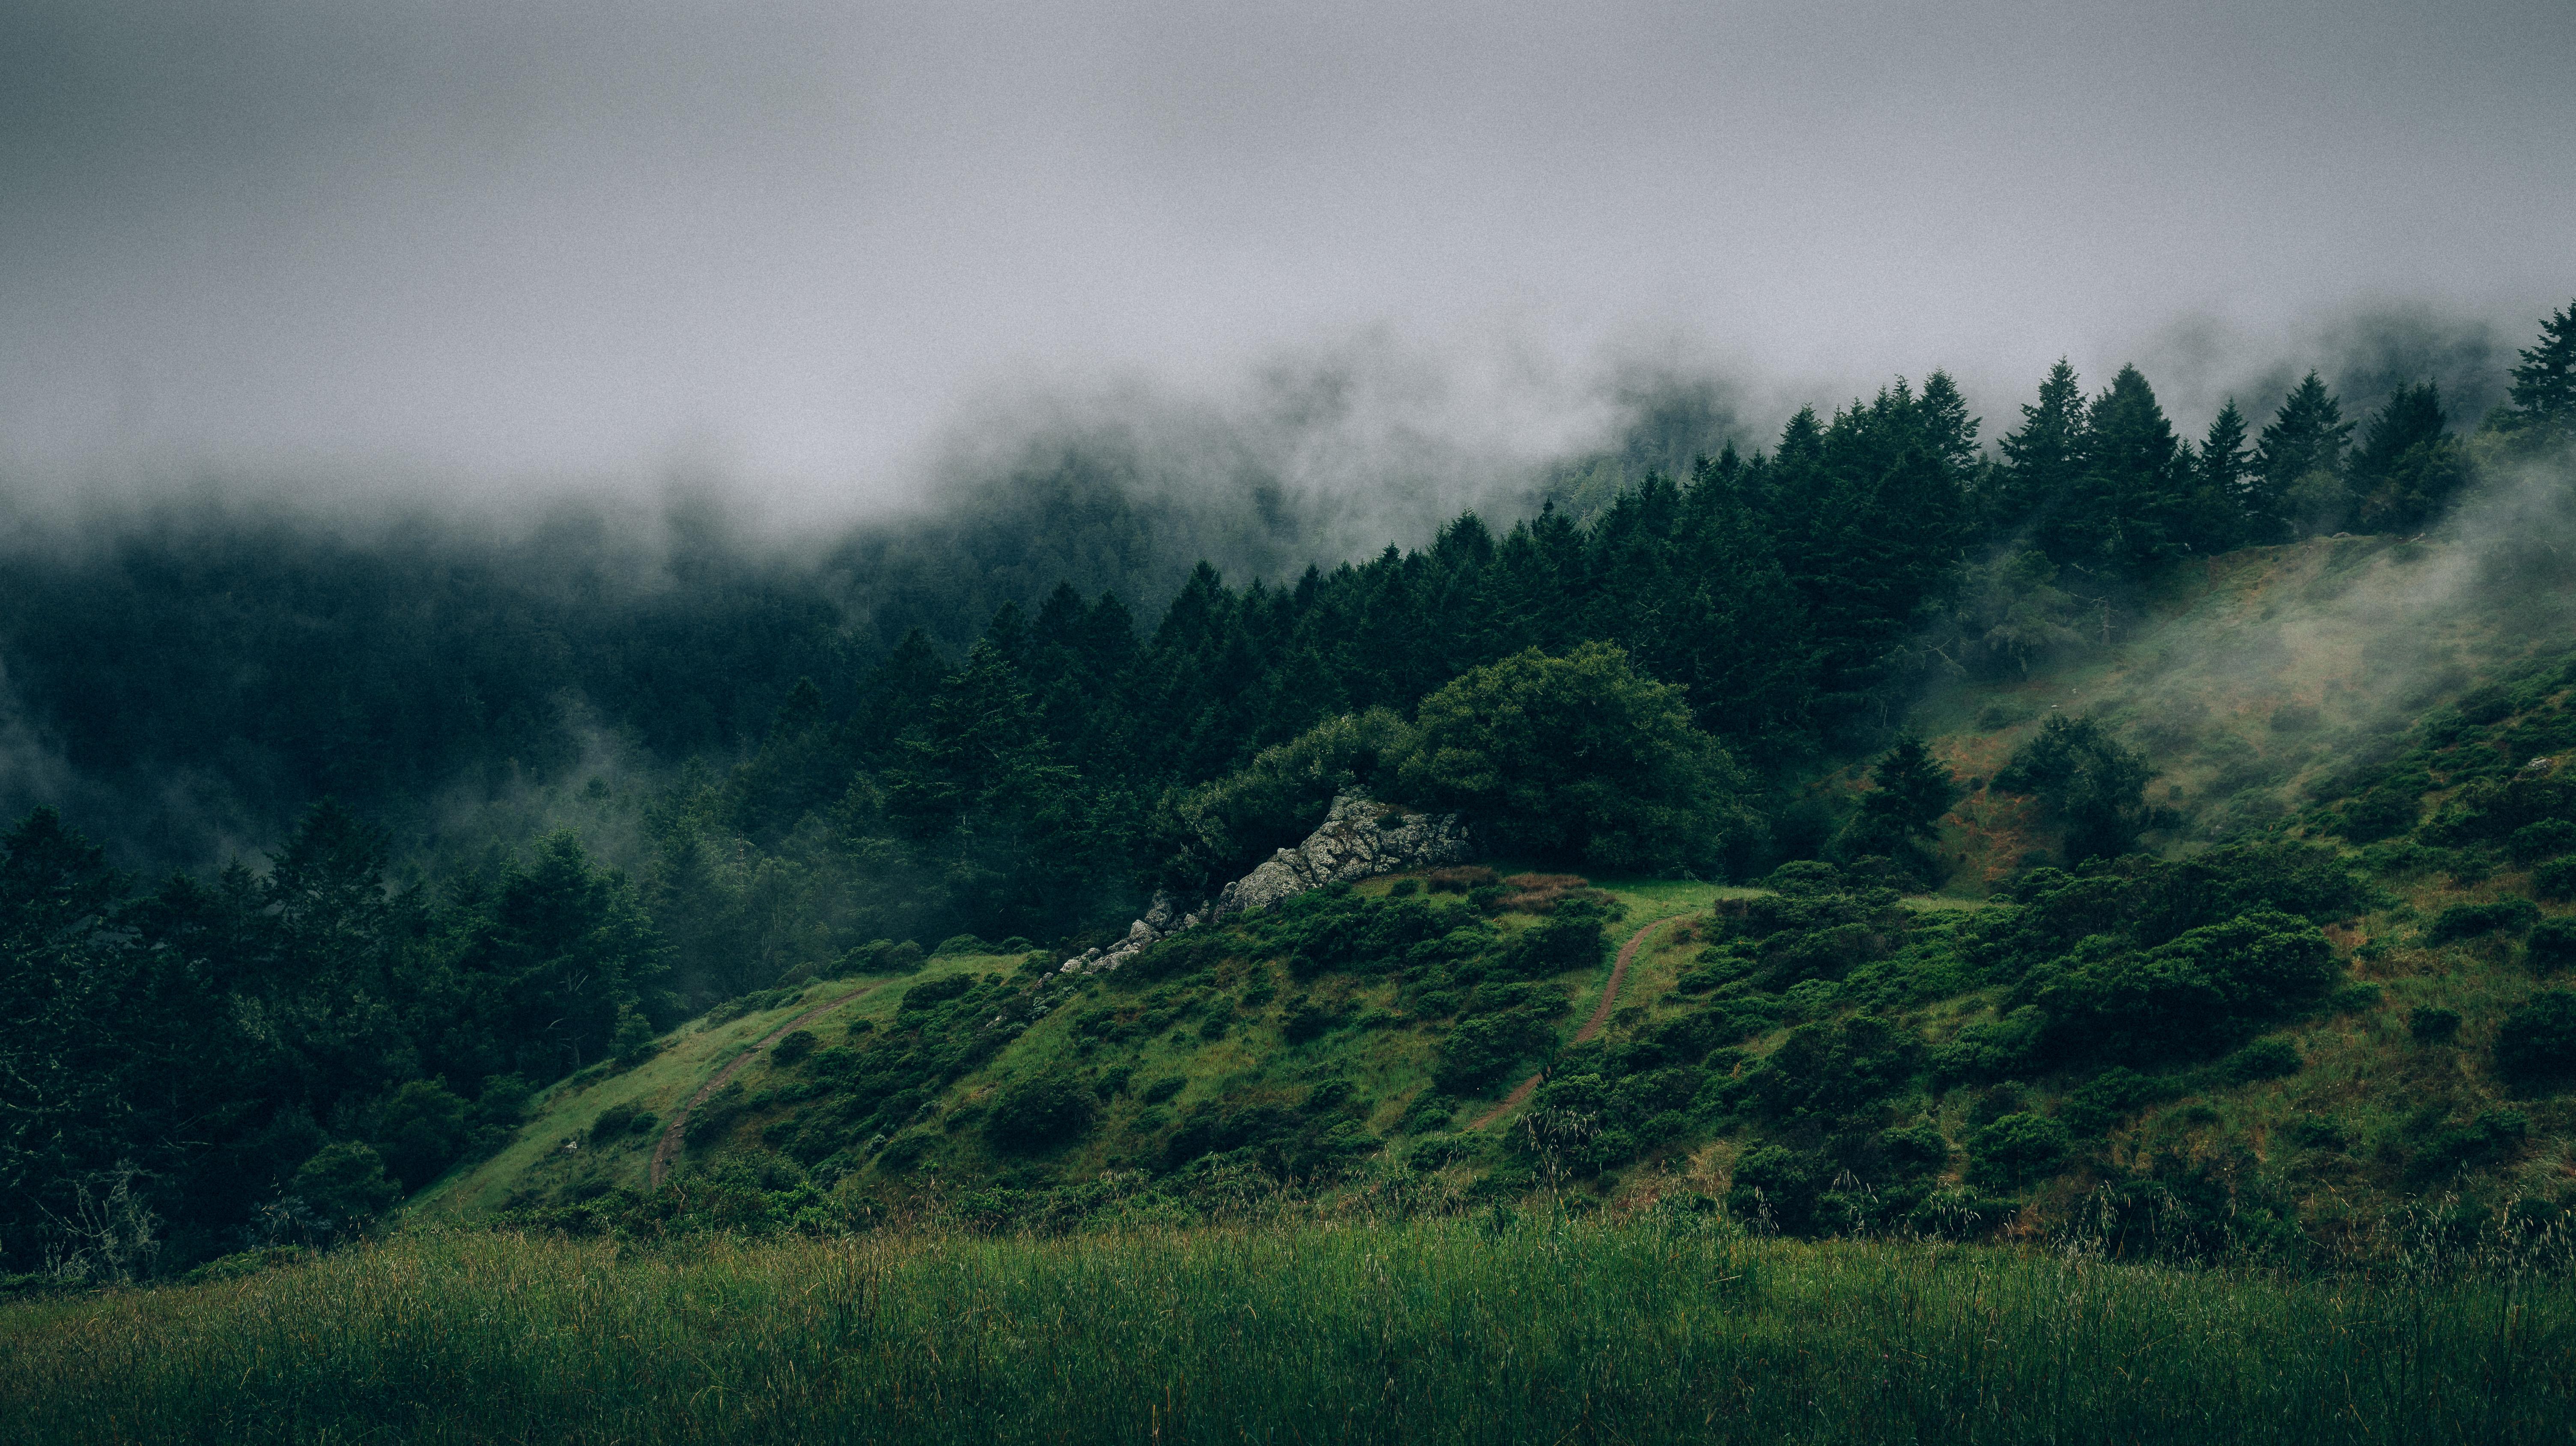 Cloudy Mountain Wallpaper 4K 5K | HD Wallpaper Background